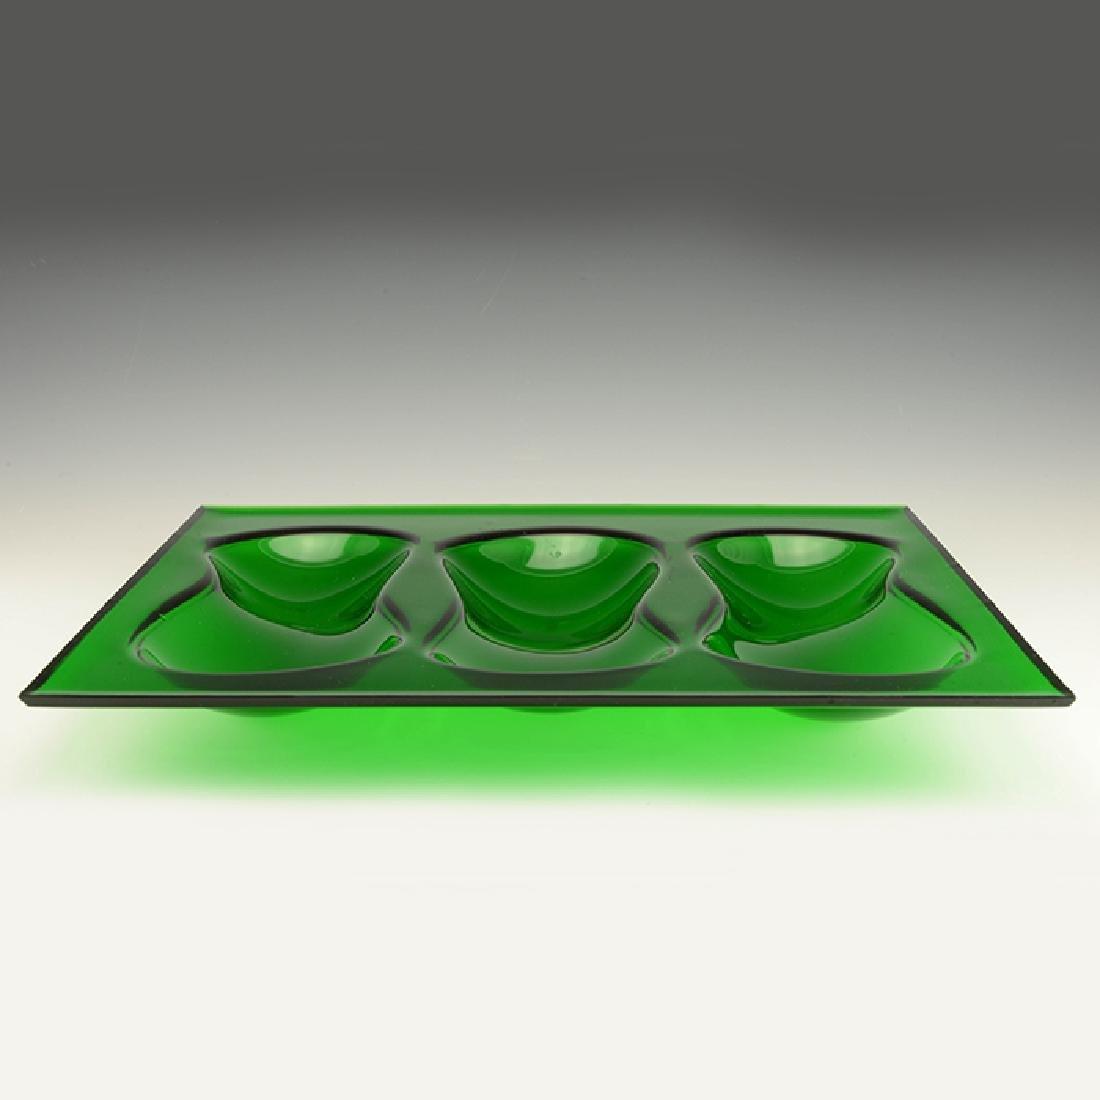 Eva Zeisel, Rare Cloverware Gourd Tray in Green - 3